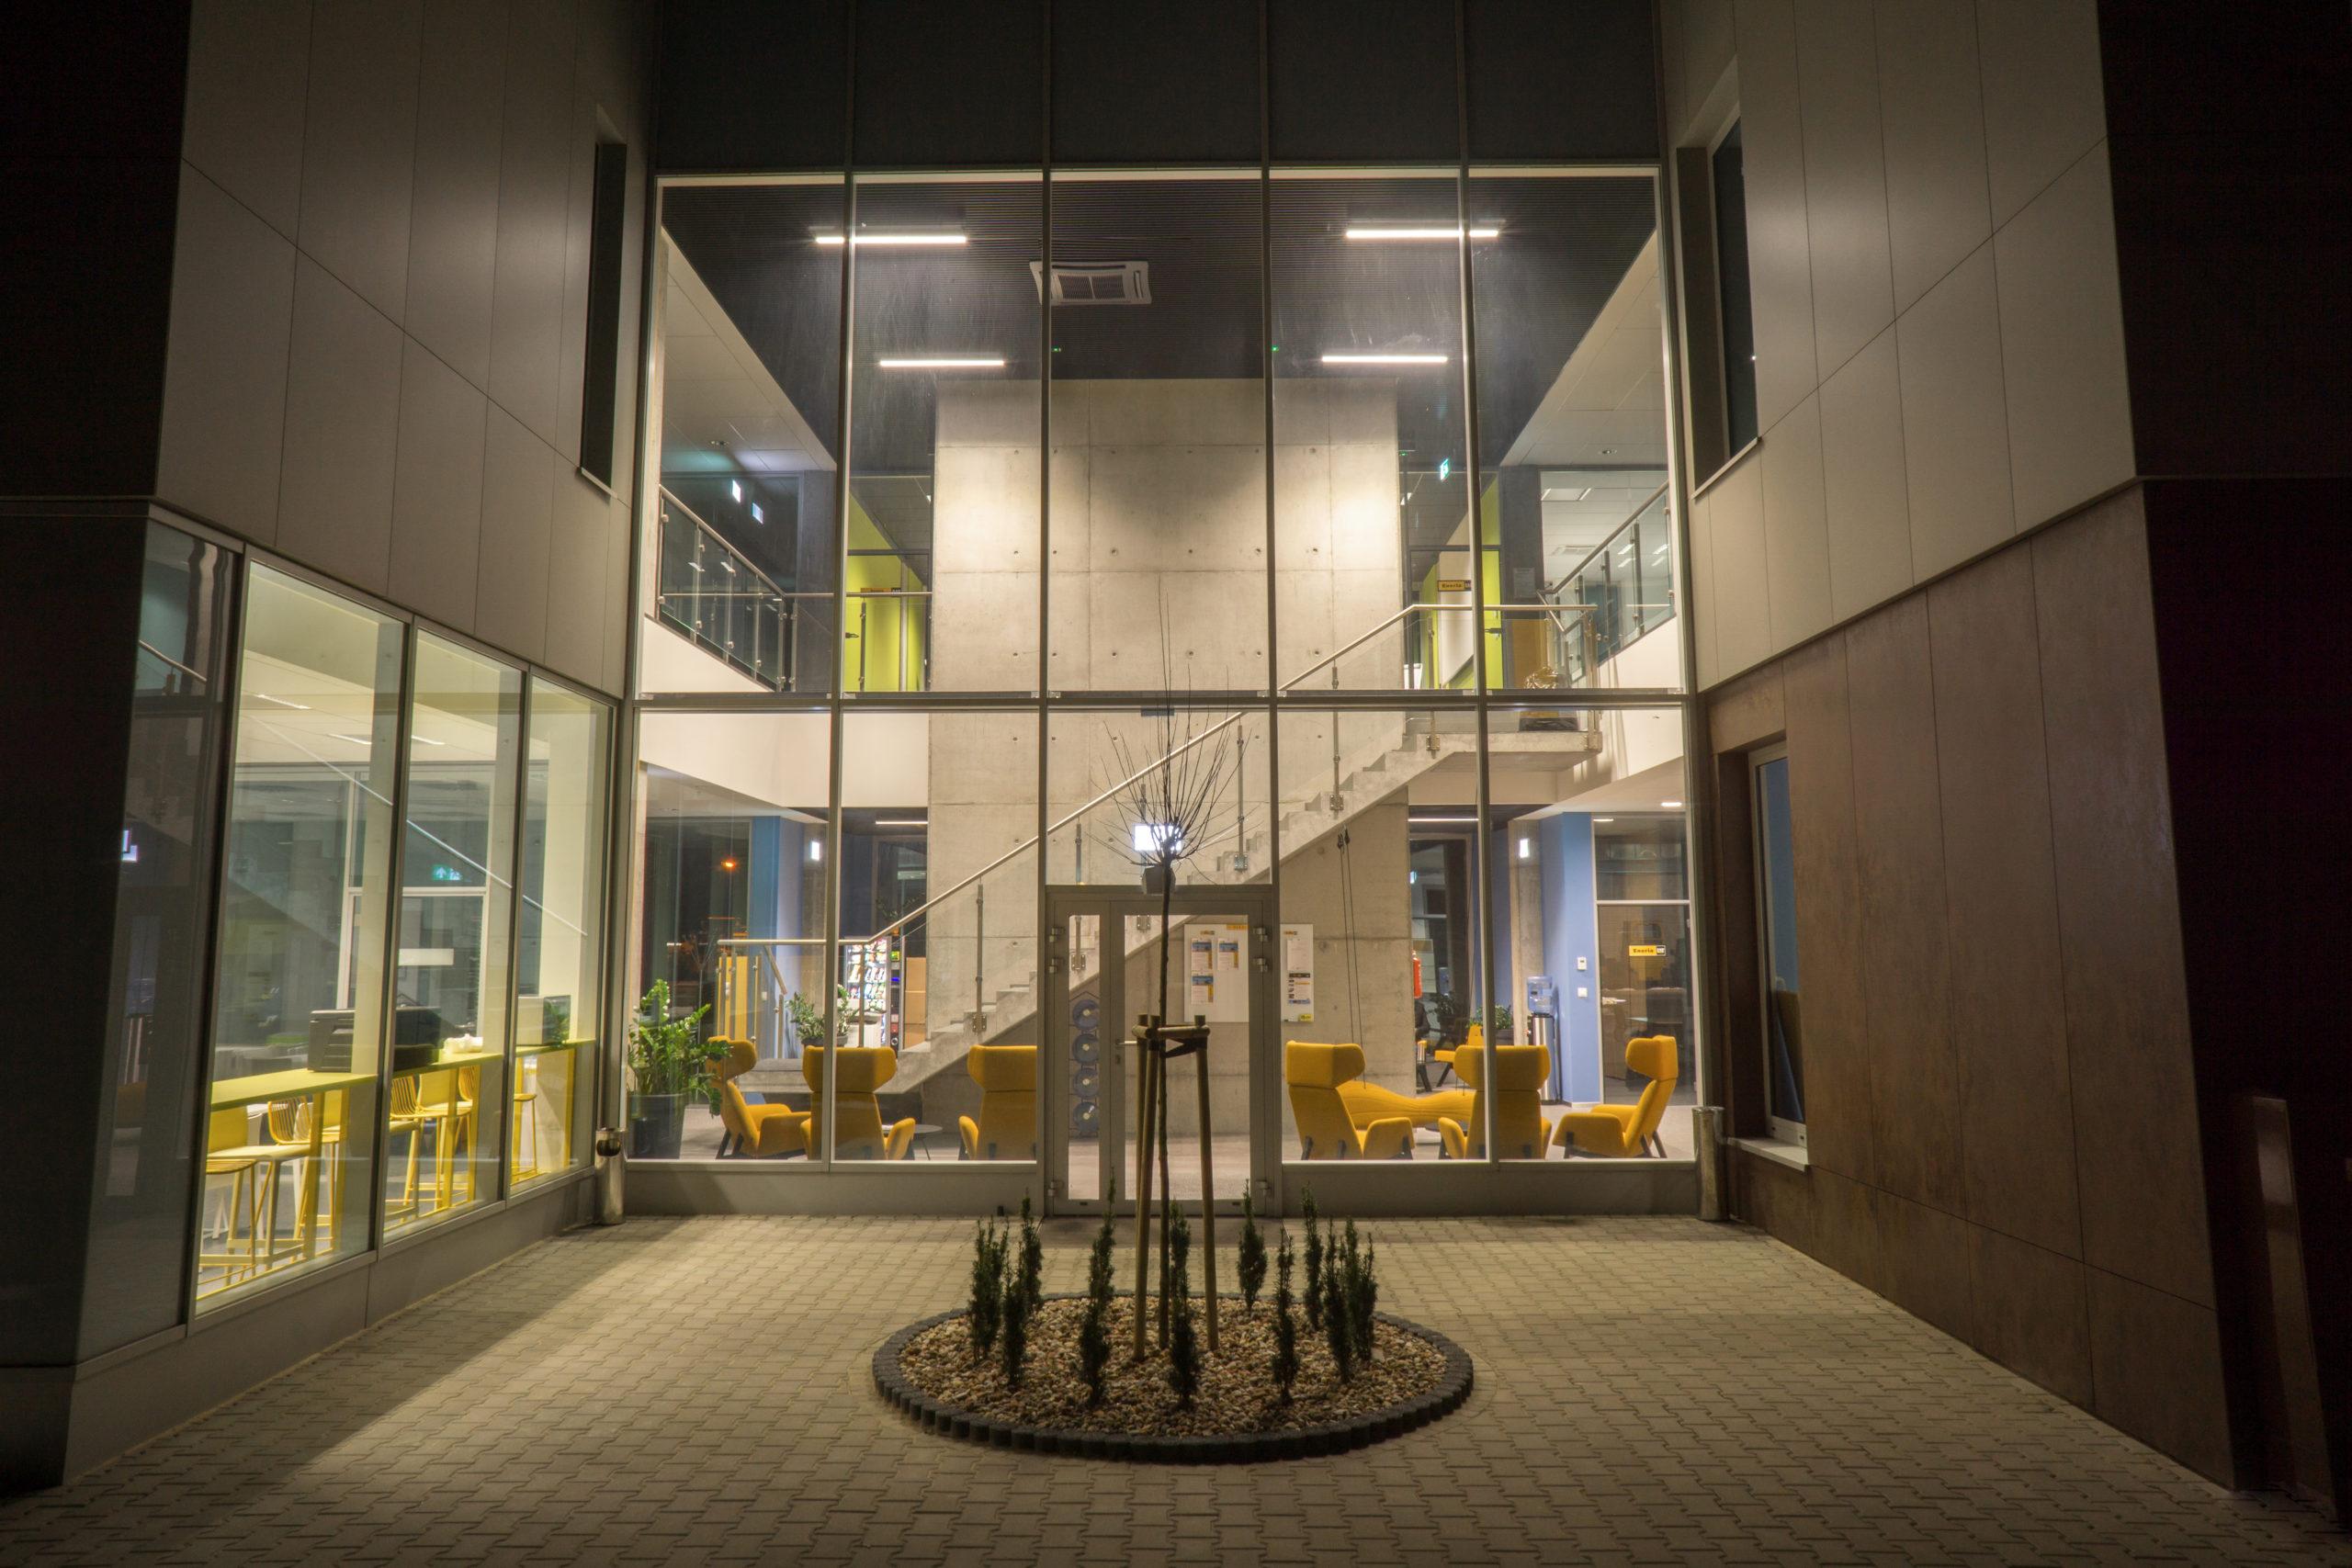 bergerat monnoyeur, budynek biurowo-serwisowy, caterpillar, patio, architekt katowice